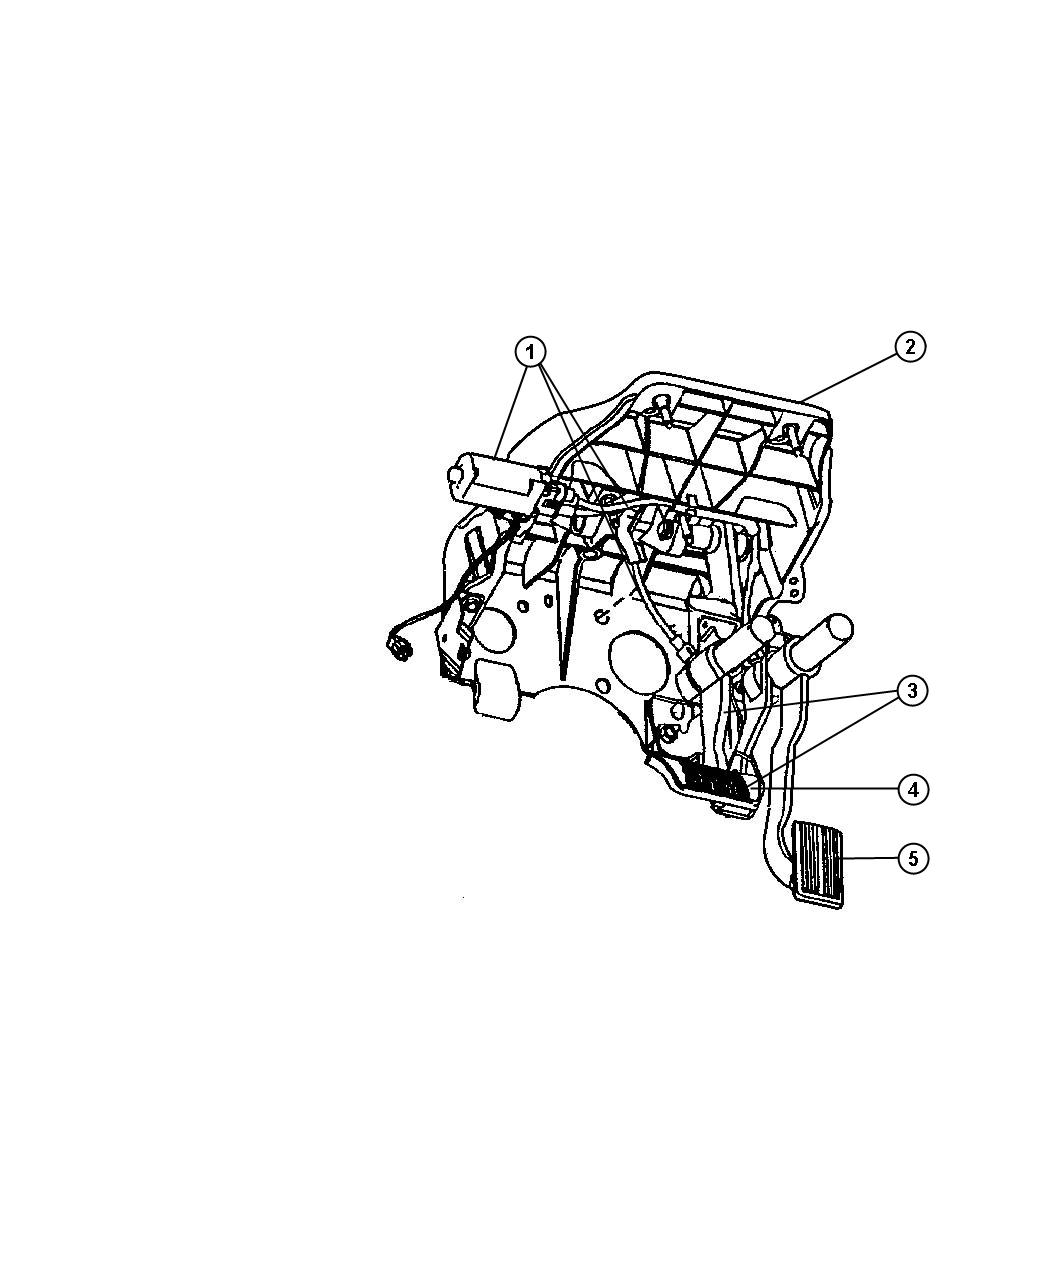 hight resolution of 2004 dodge ram 2500 engine diagram 2004 2500 dodge ram wiring diagram dodge ram 2500 parts